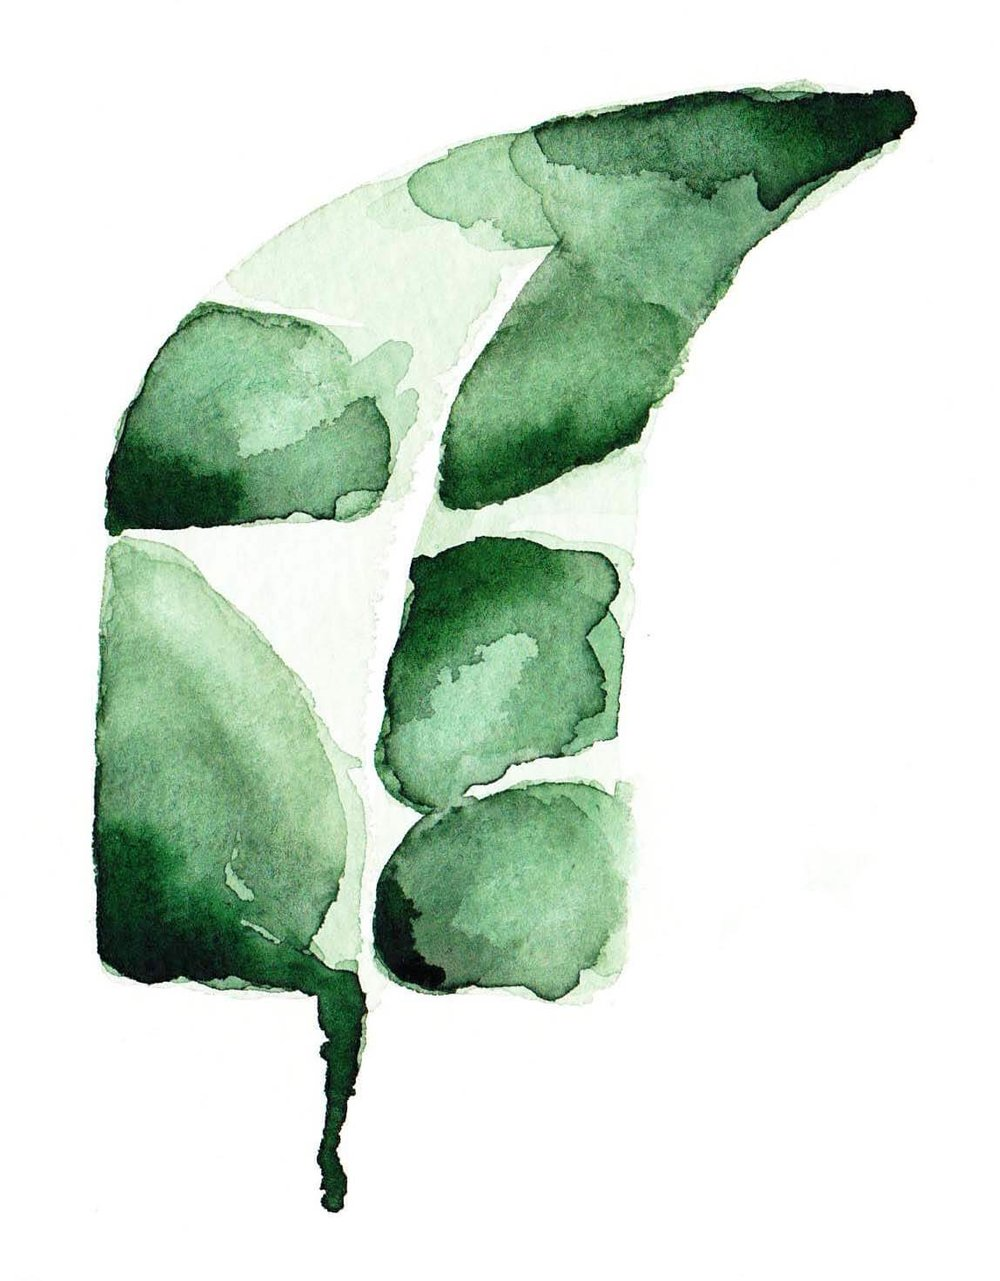 On Cloud Bloom - banana leaf 4